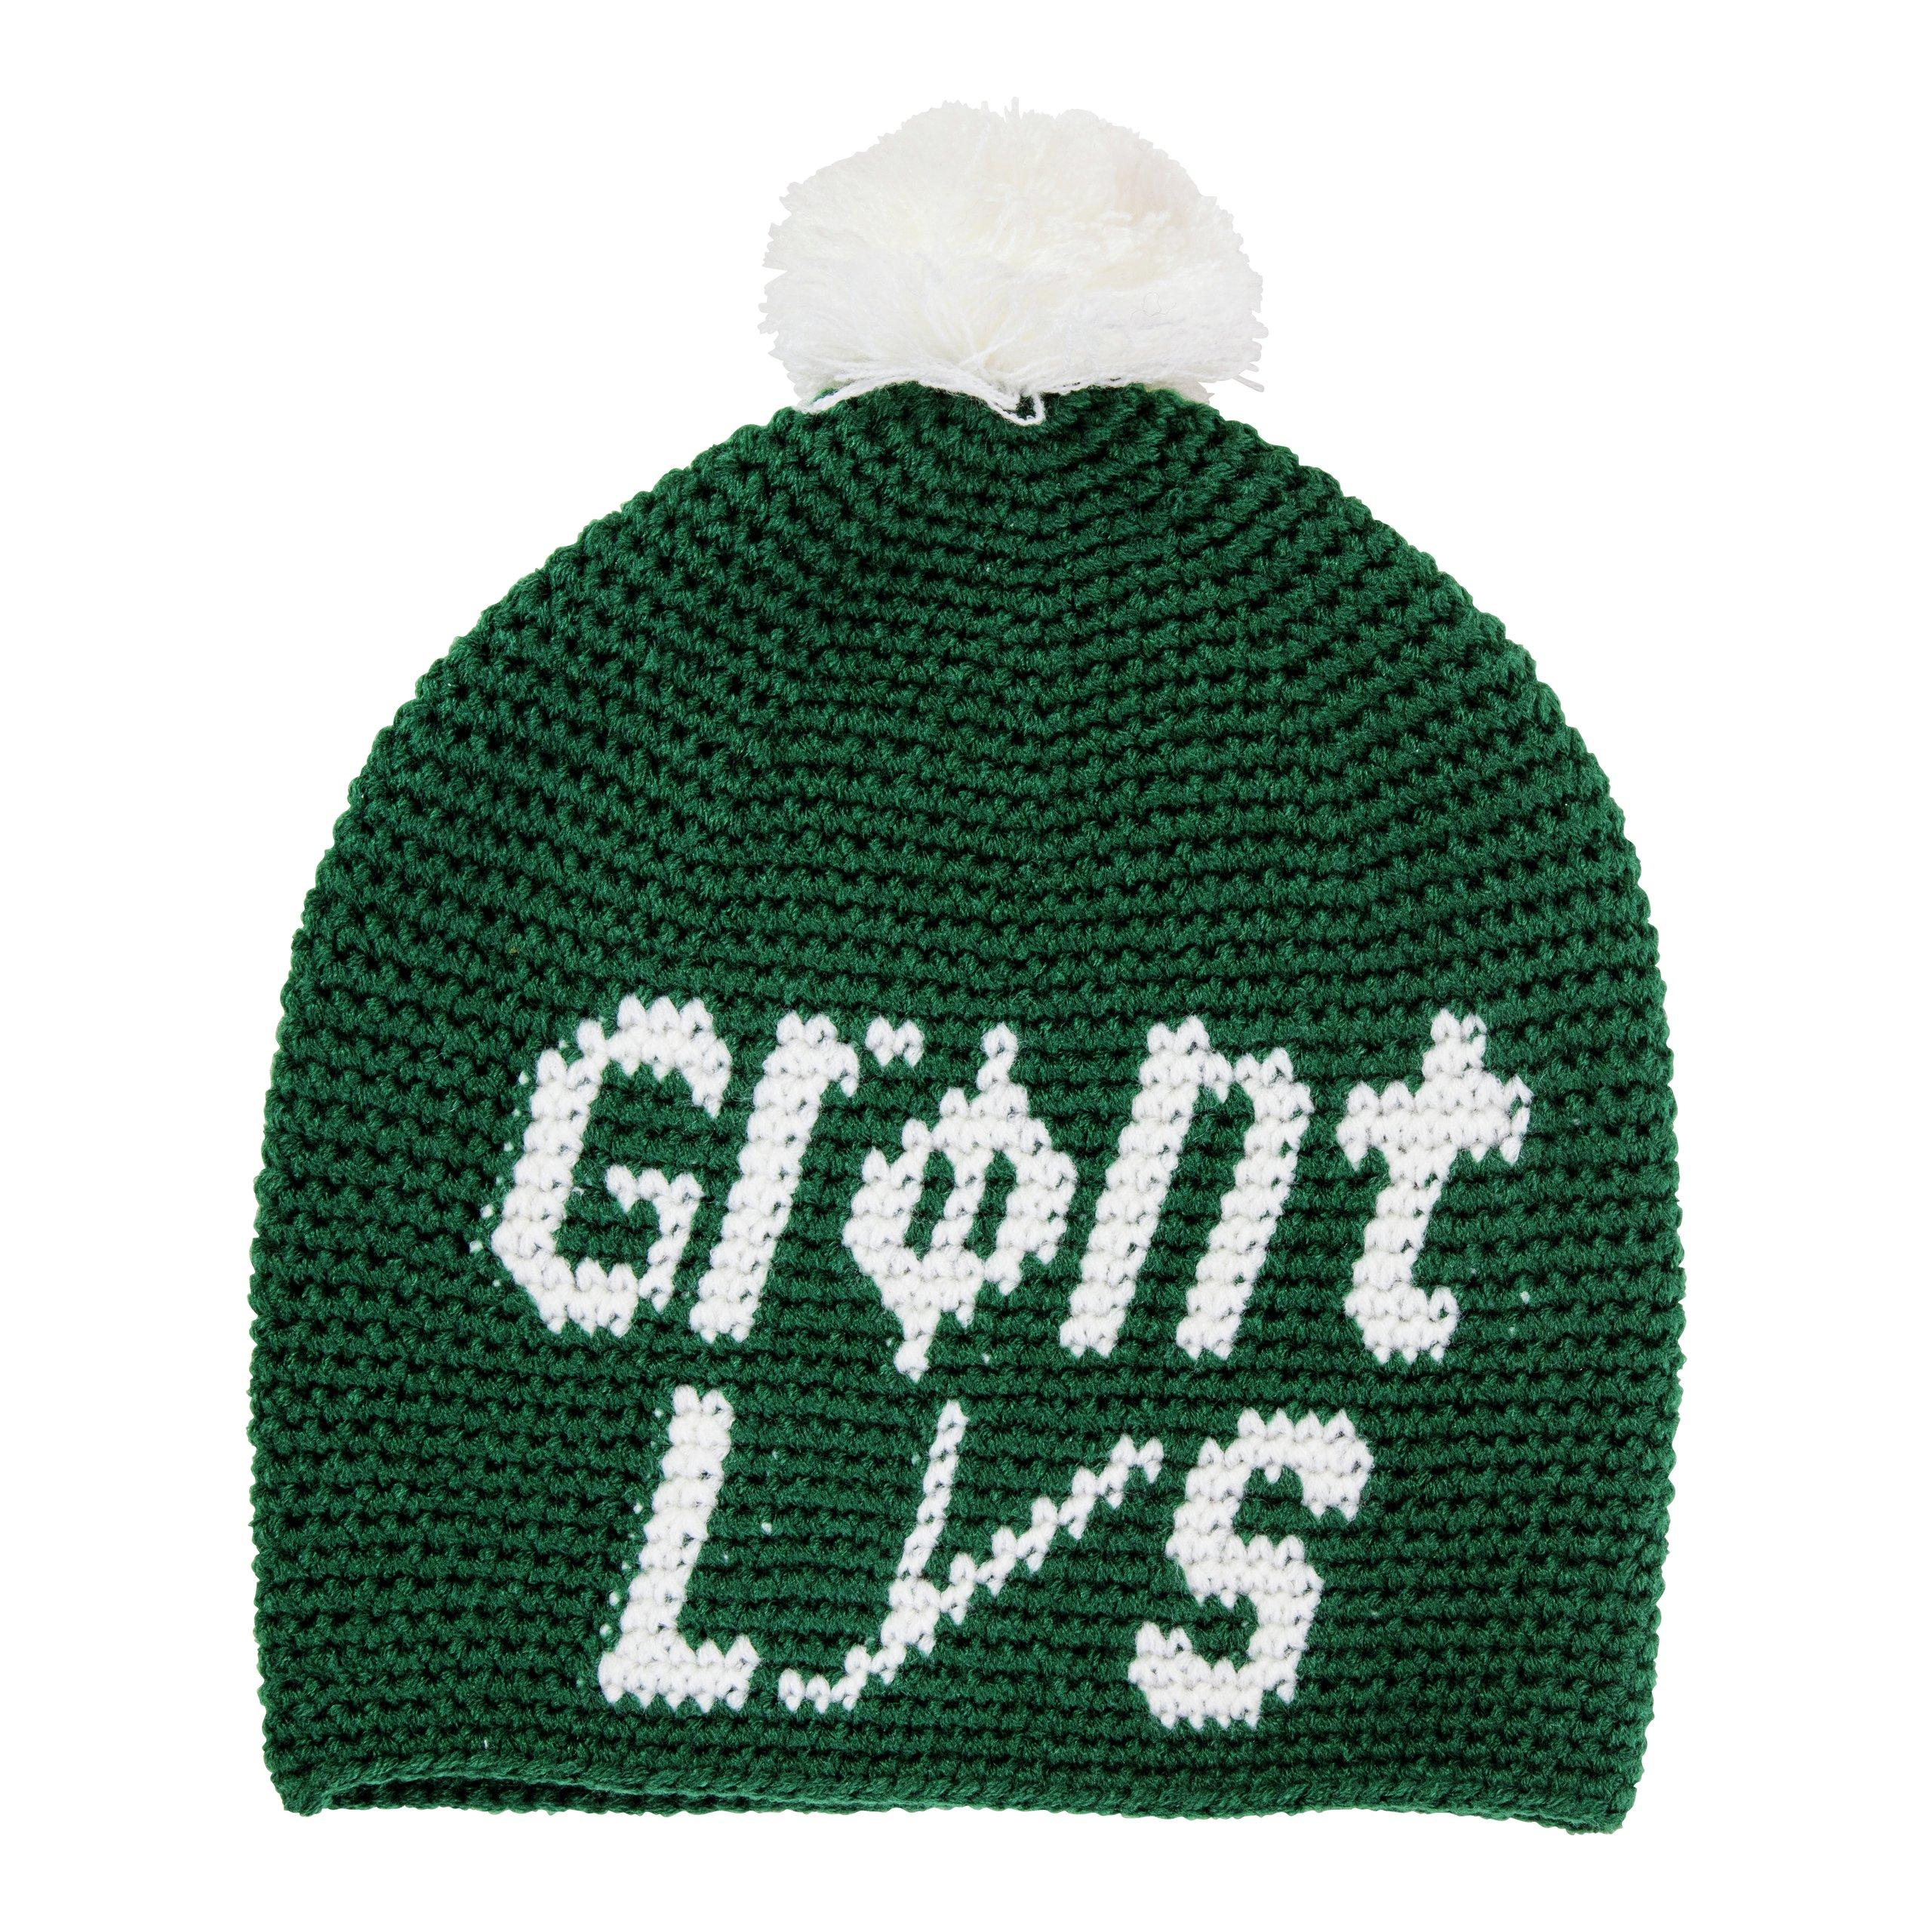 LUE M/TEXT GRØNT LYS GRØNN-LUE514